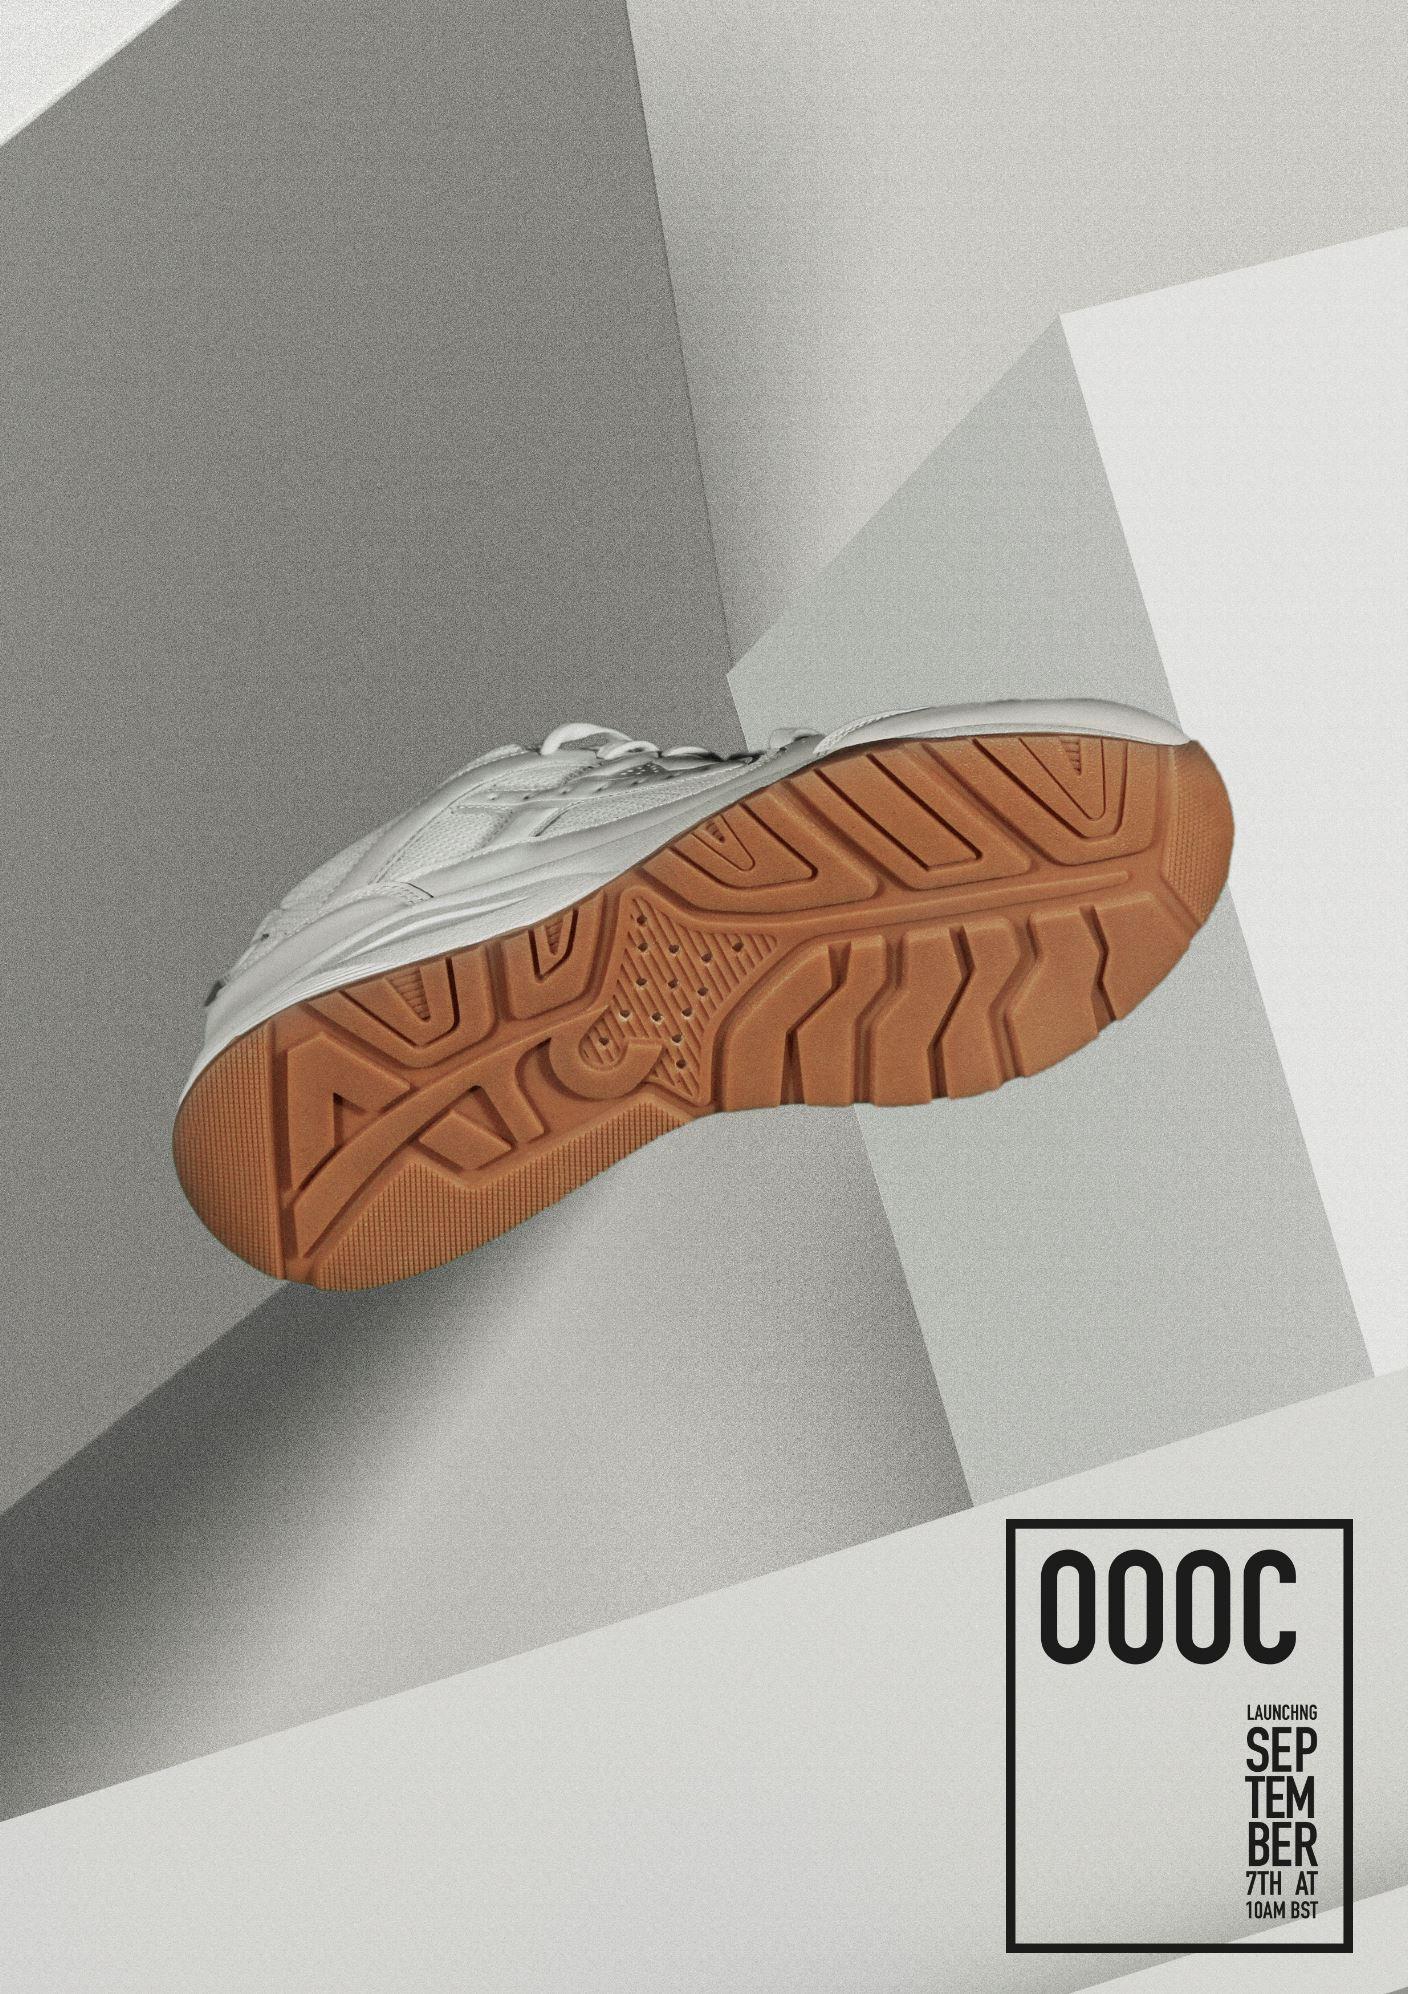 arc originals the outset 000c release date